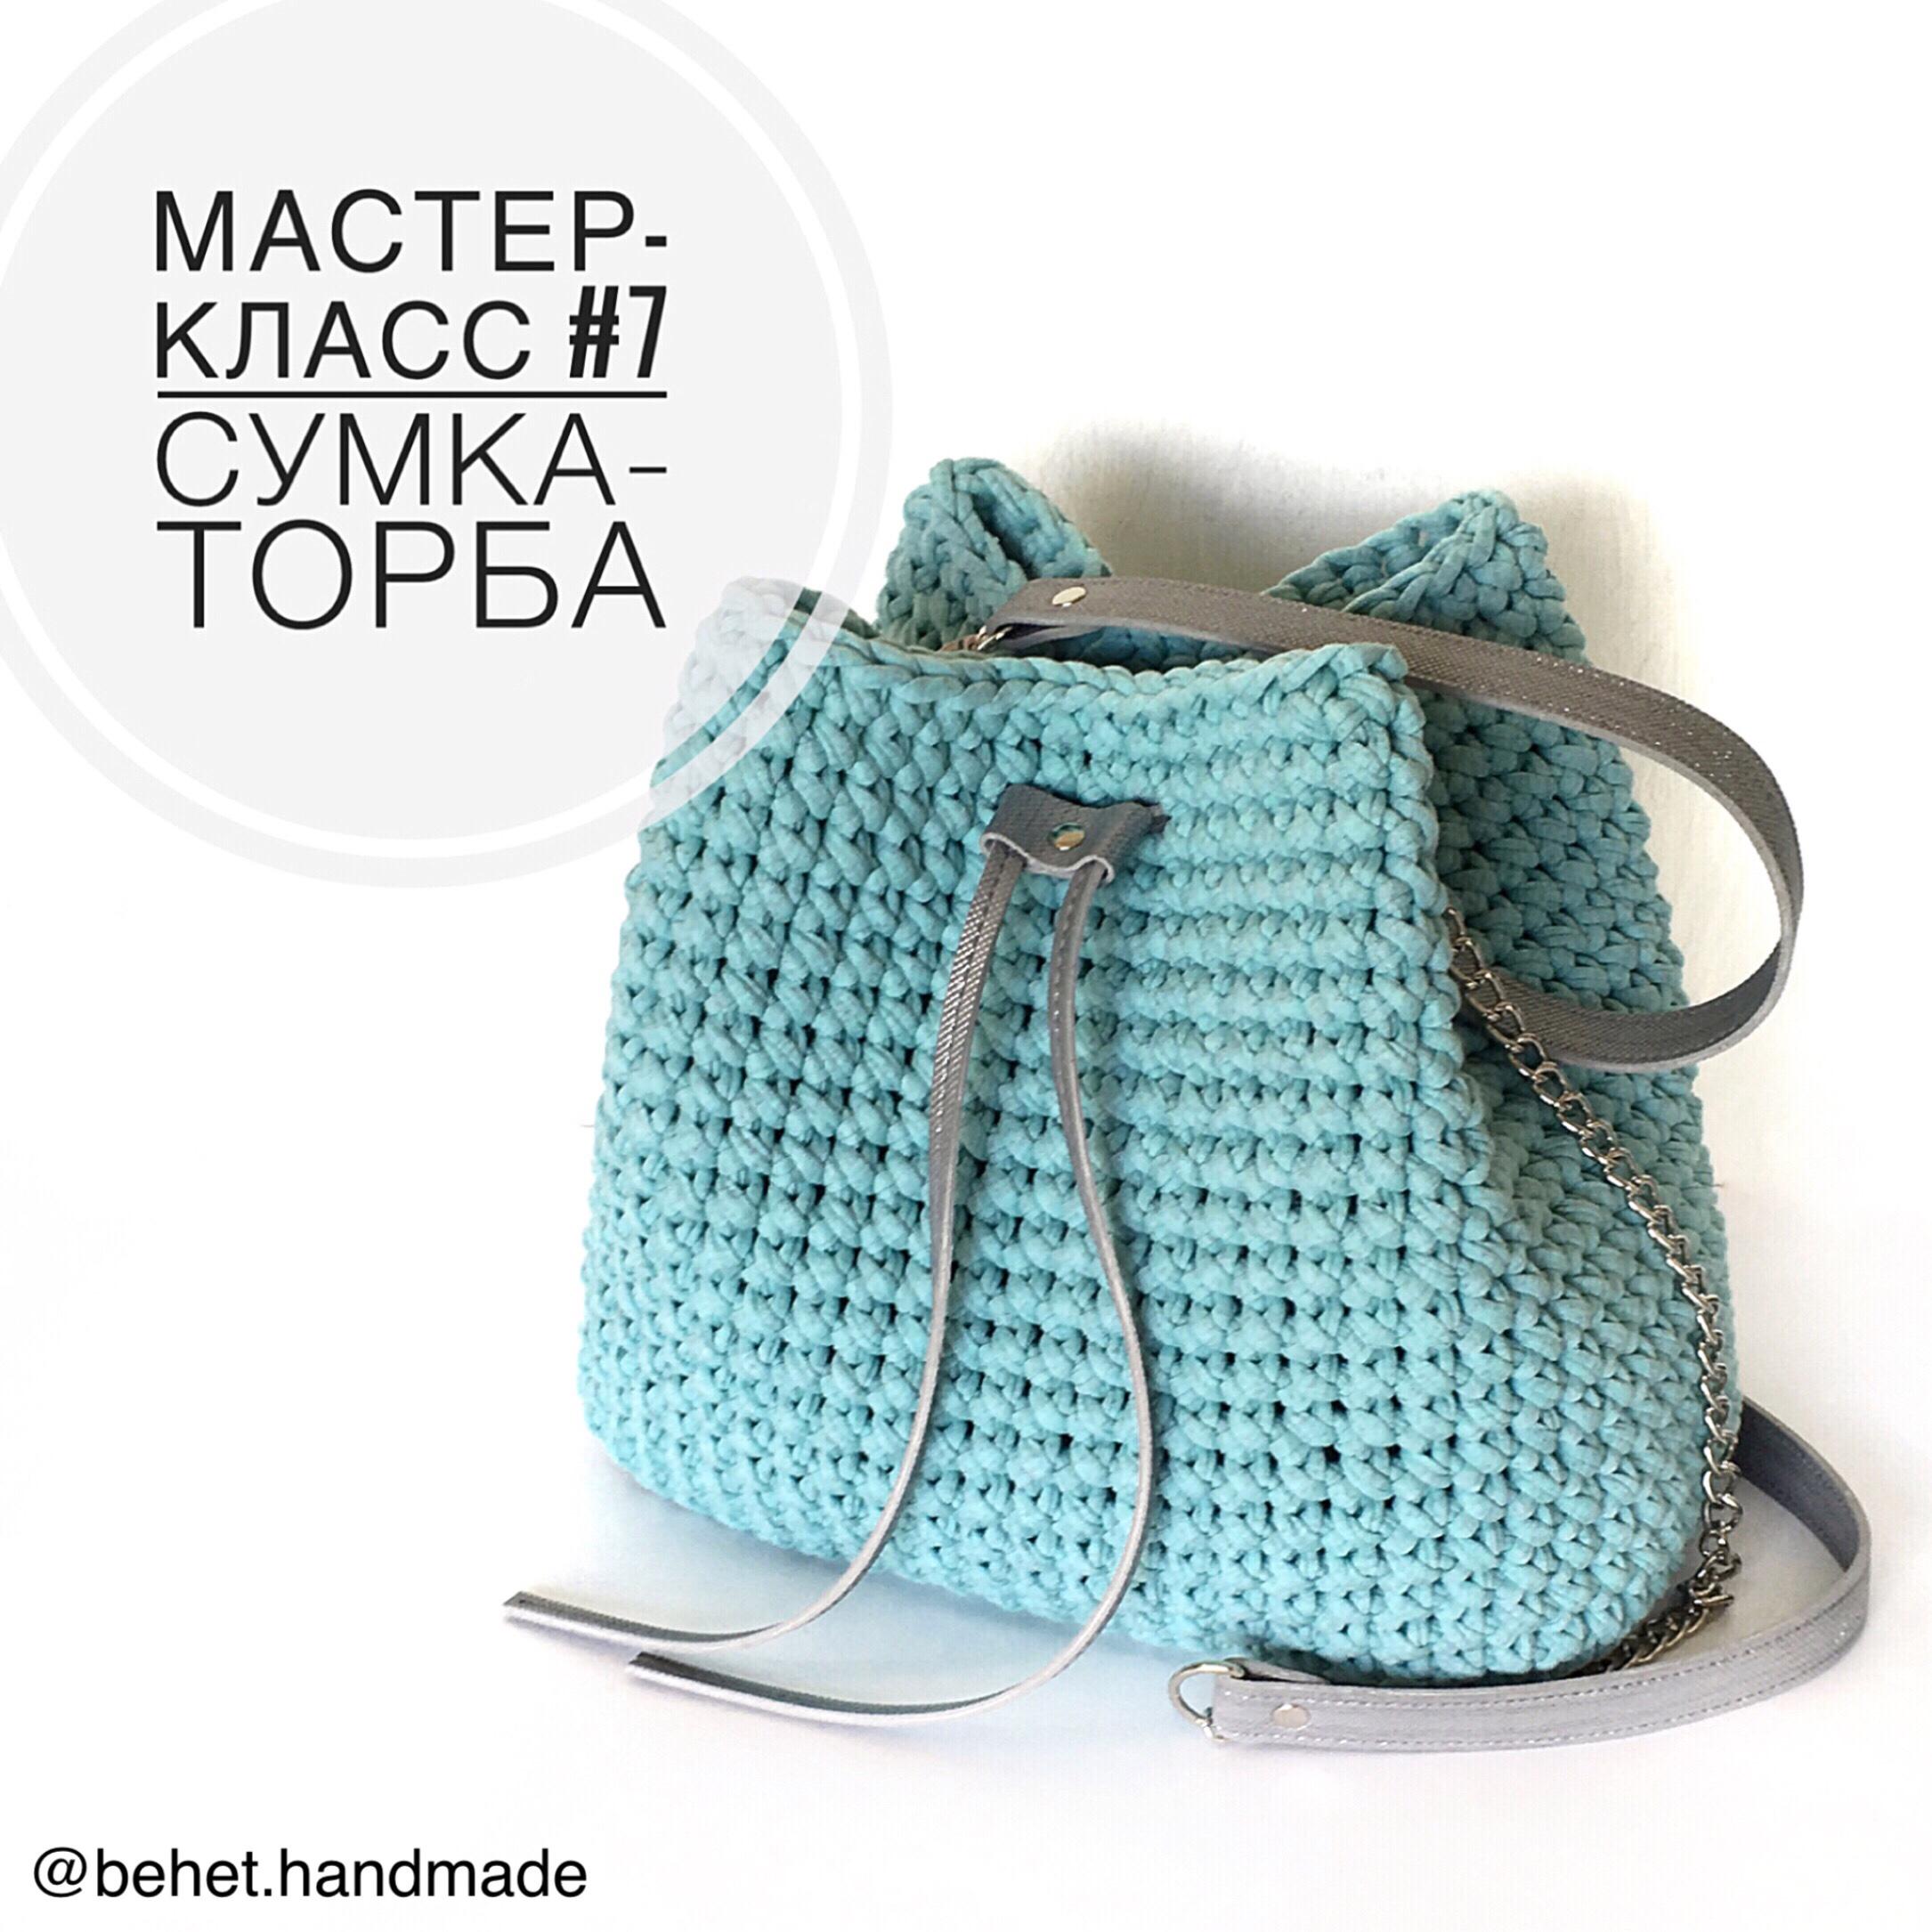 a7b5eb11e8c9 Сумка-торба из трикотажной пряжи. Мастер-класс - behet handmade